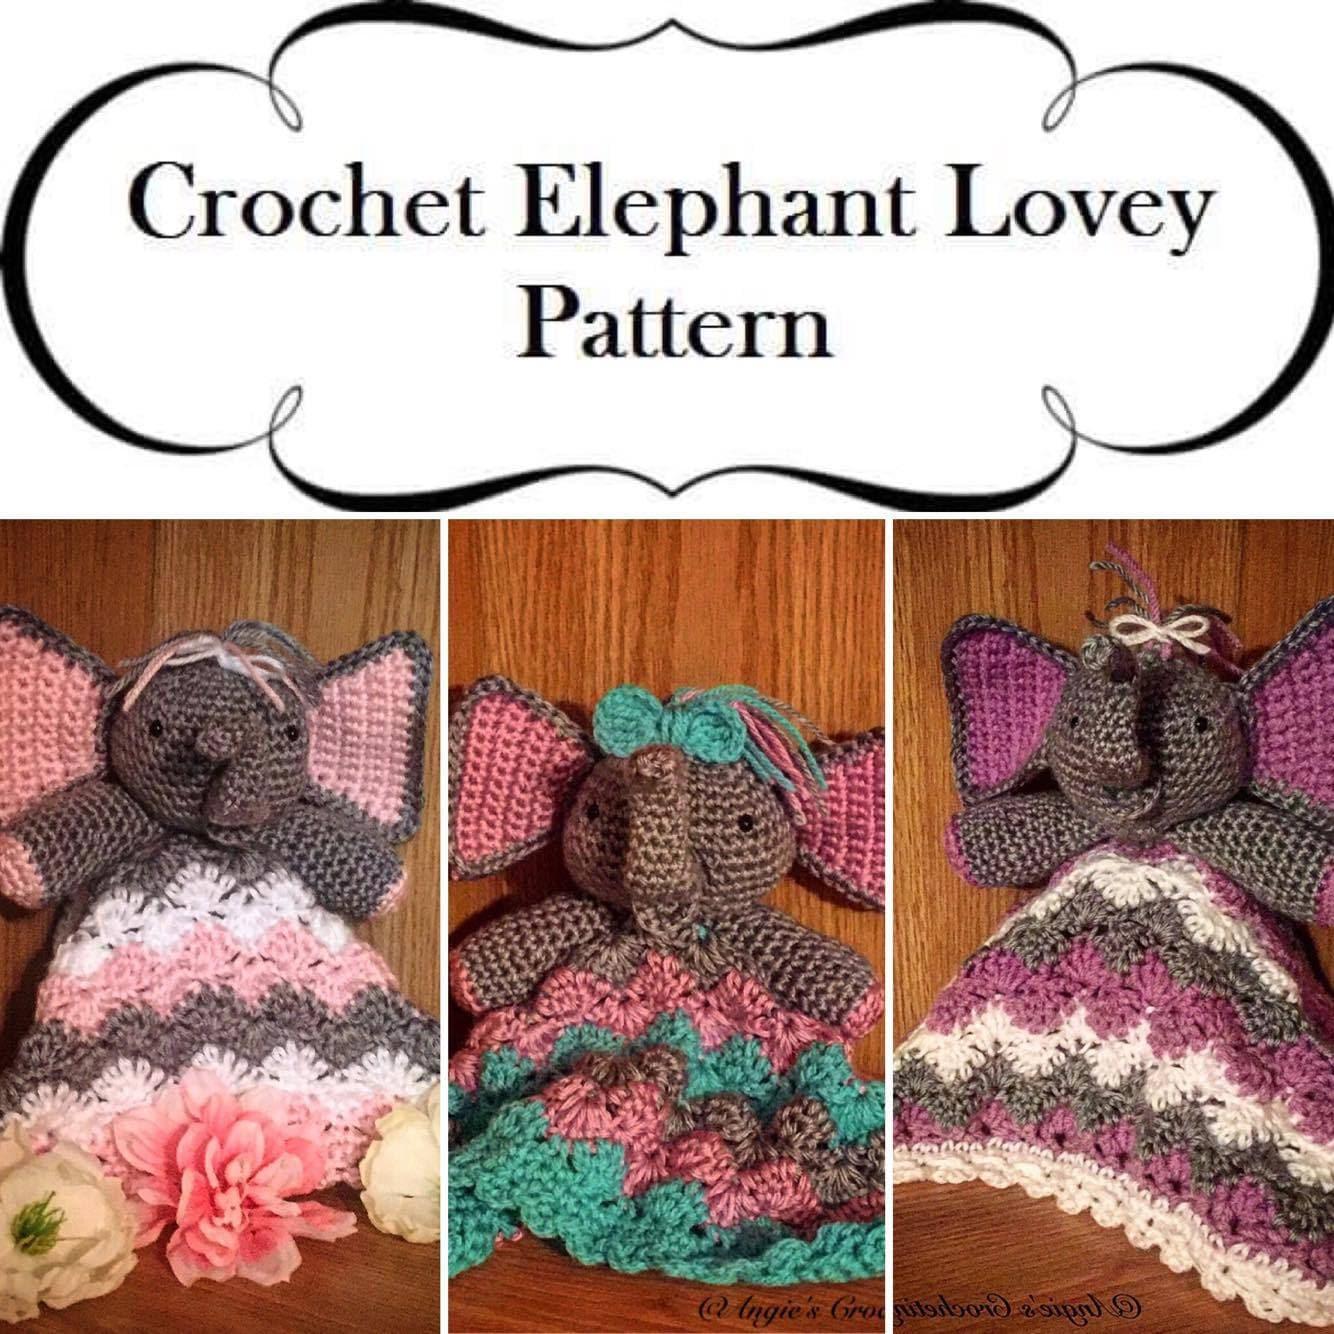 Crochet Elephant Lovey Pattern Elephant Crib Toy Crochet Etsy